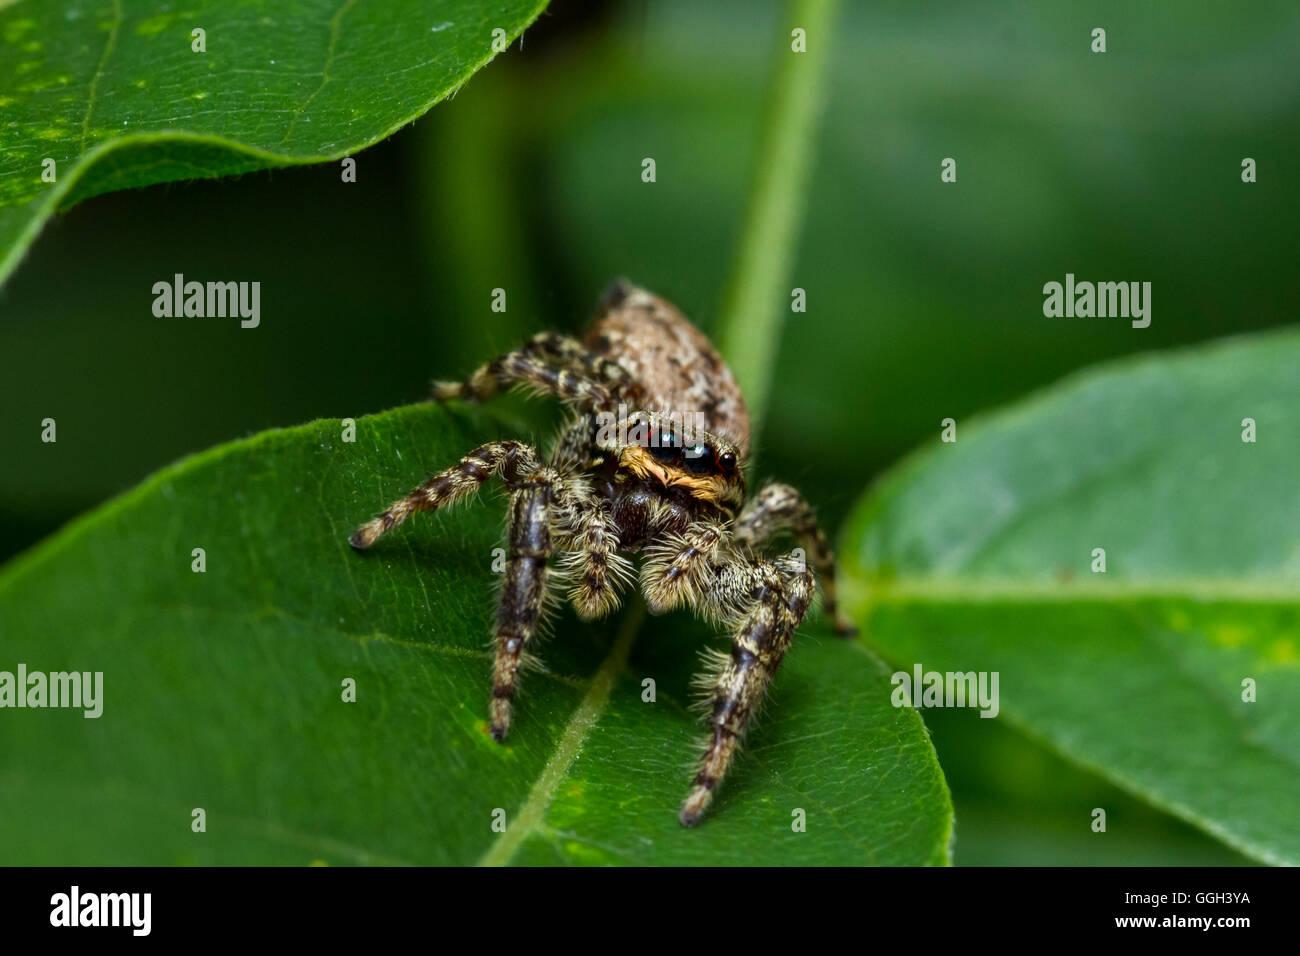 Springspinne, Insekt, Spinne, Tier, Fauna, Beine, Körper, Augen, Makro, Nah, groß, spider, natur, blatt, - Stock Image